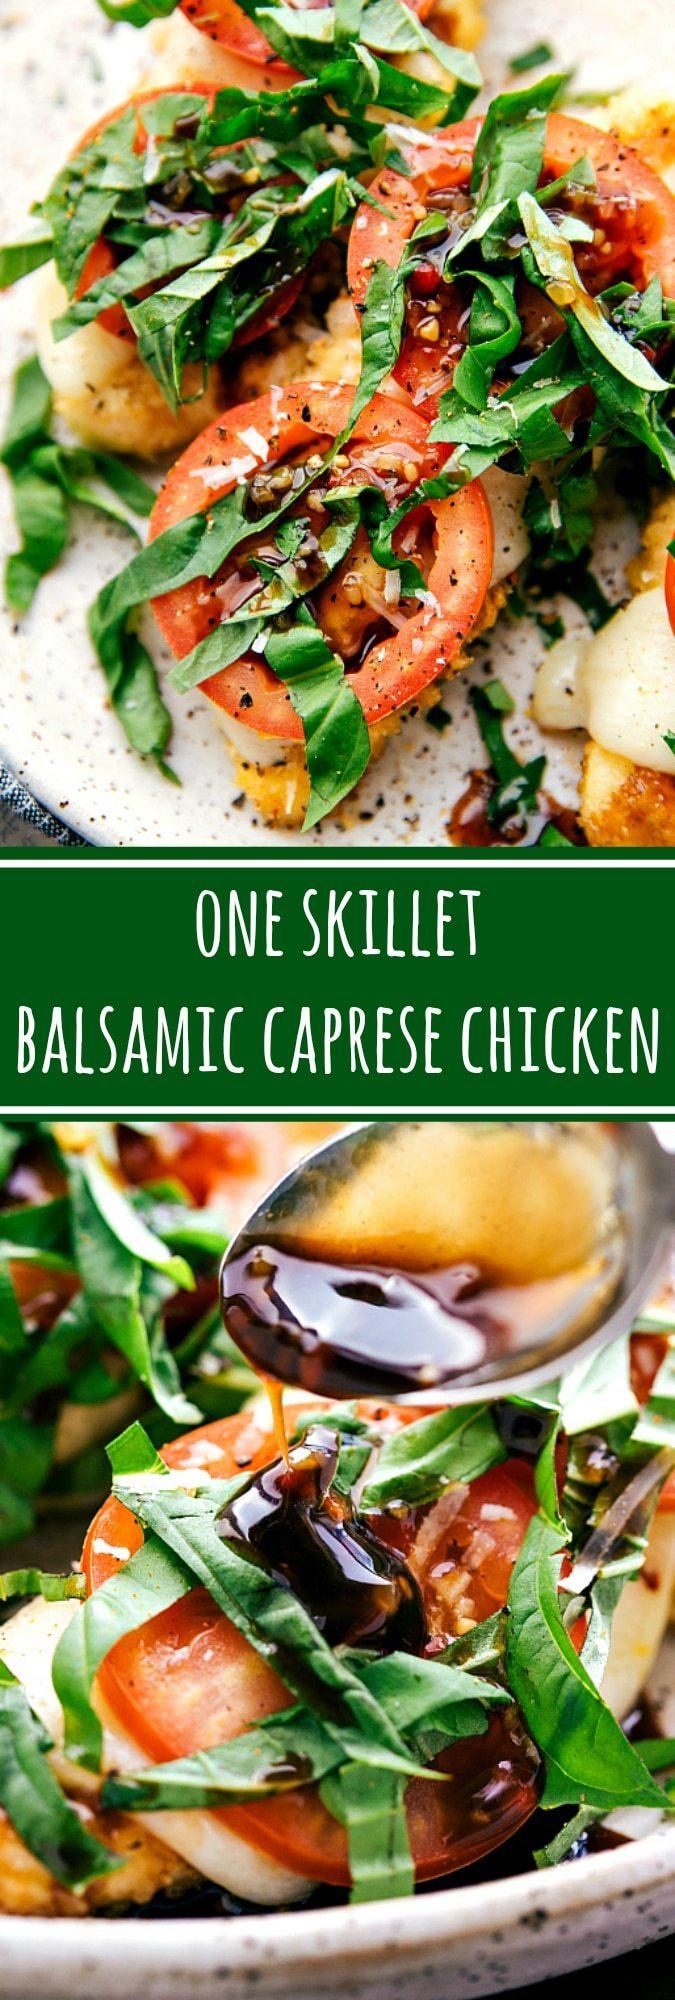 The EASIEST chicken dinner! One skillet, 10 easy ingredients caprese chicken